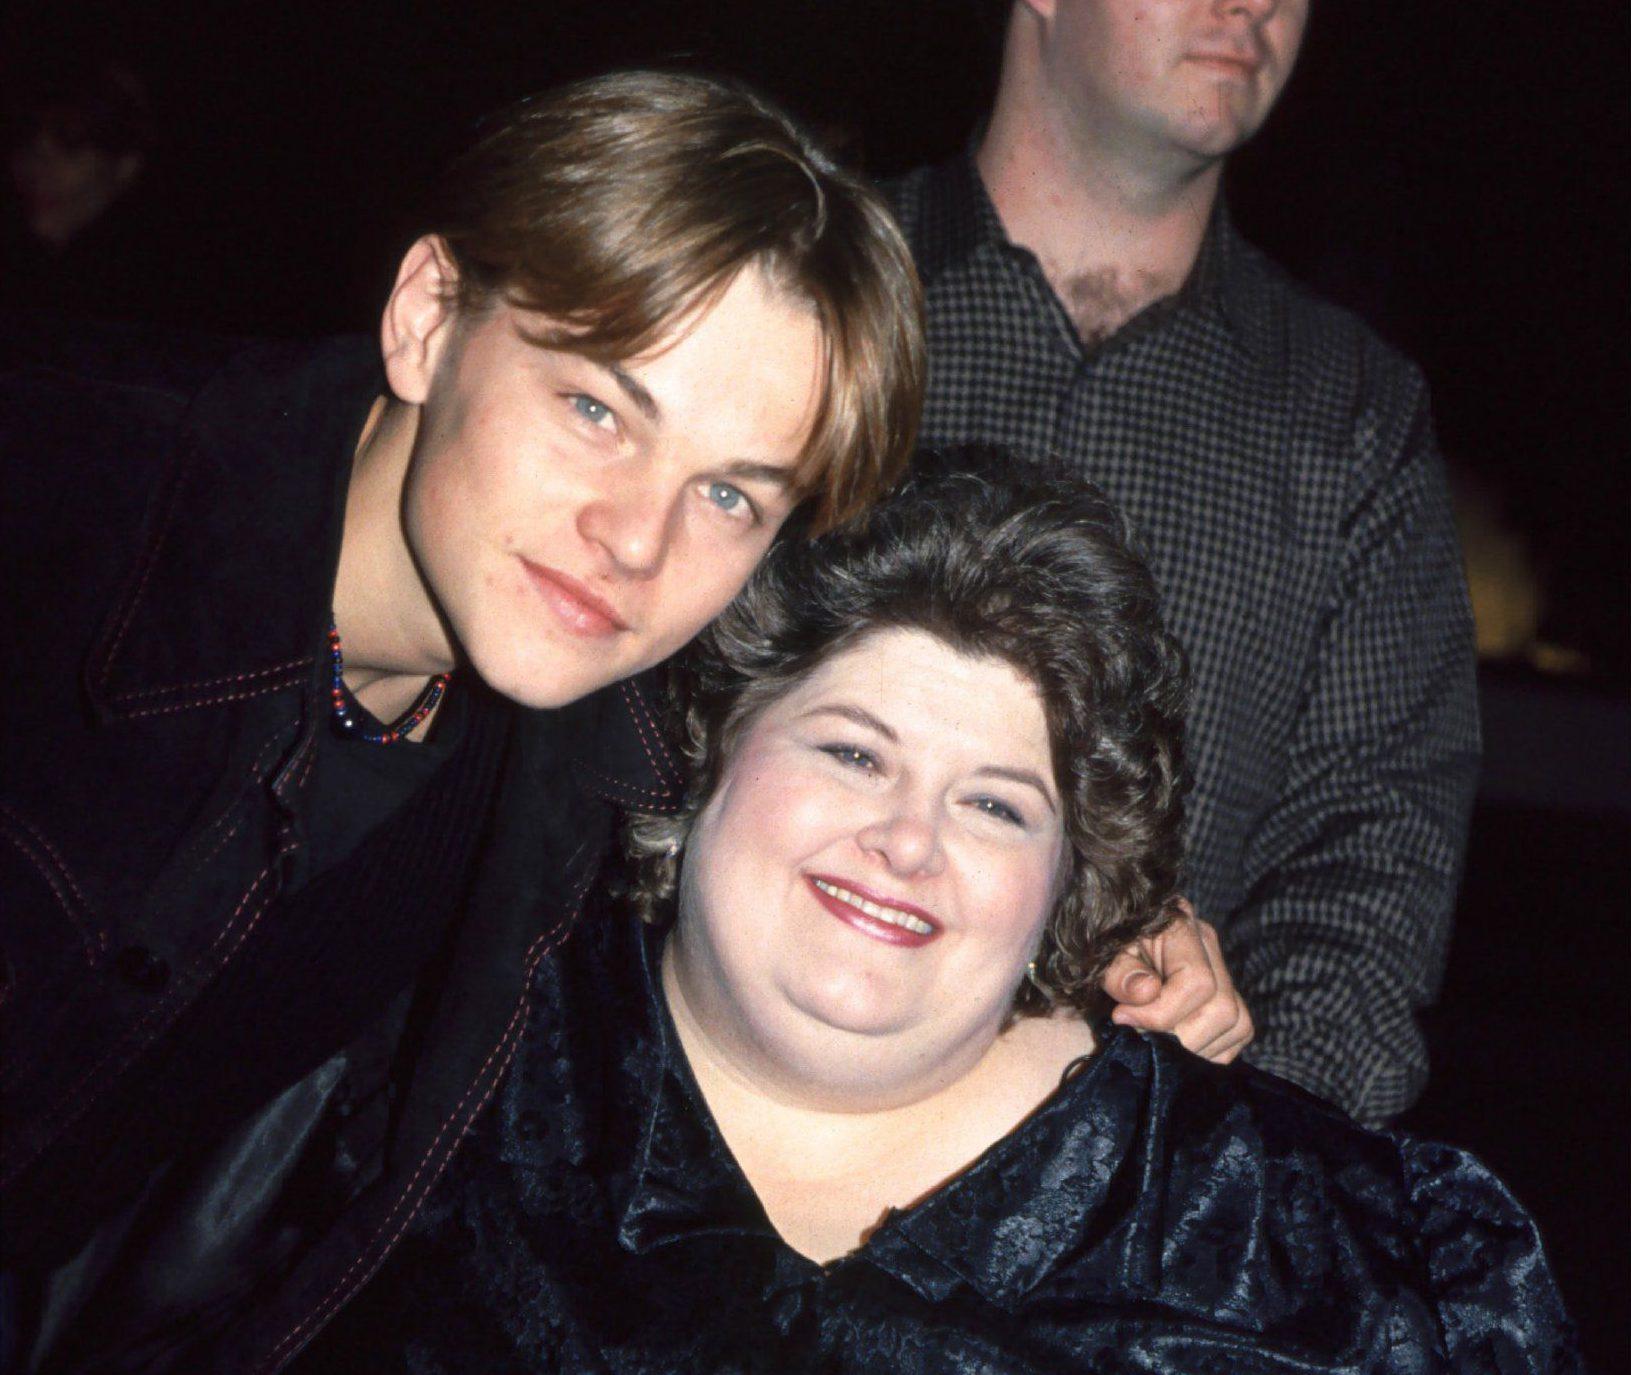 Leonardo DiCaprio posts moving tribute to on-screen mum Darlene Cates